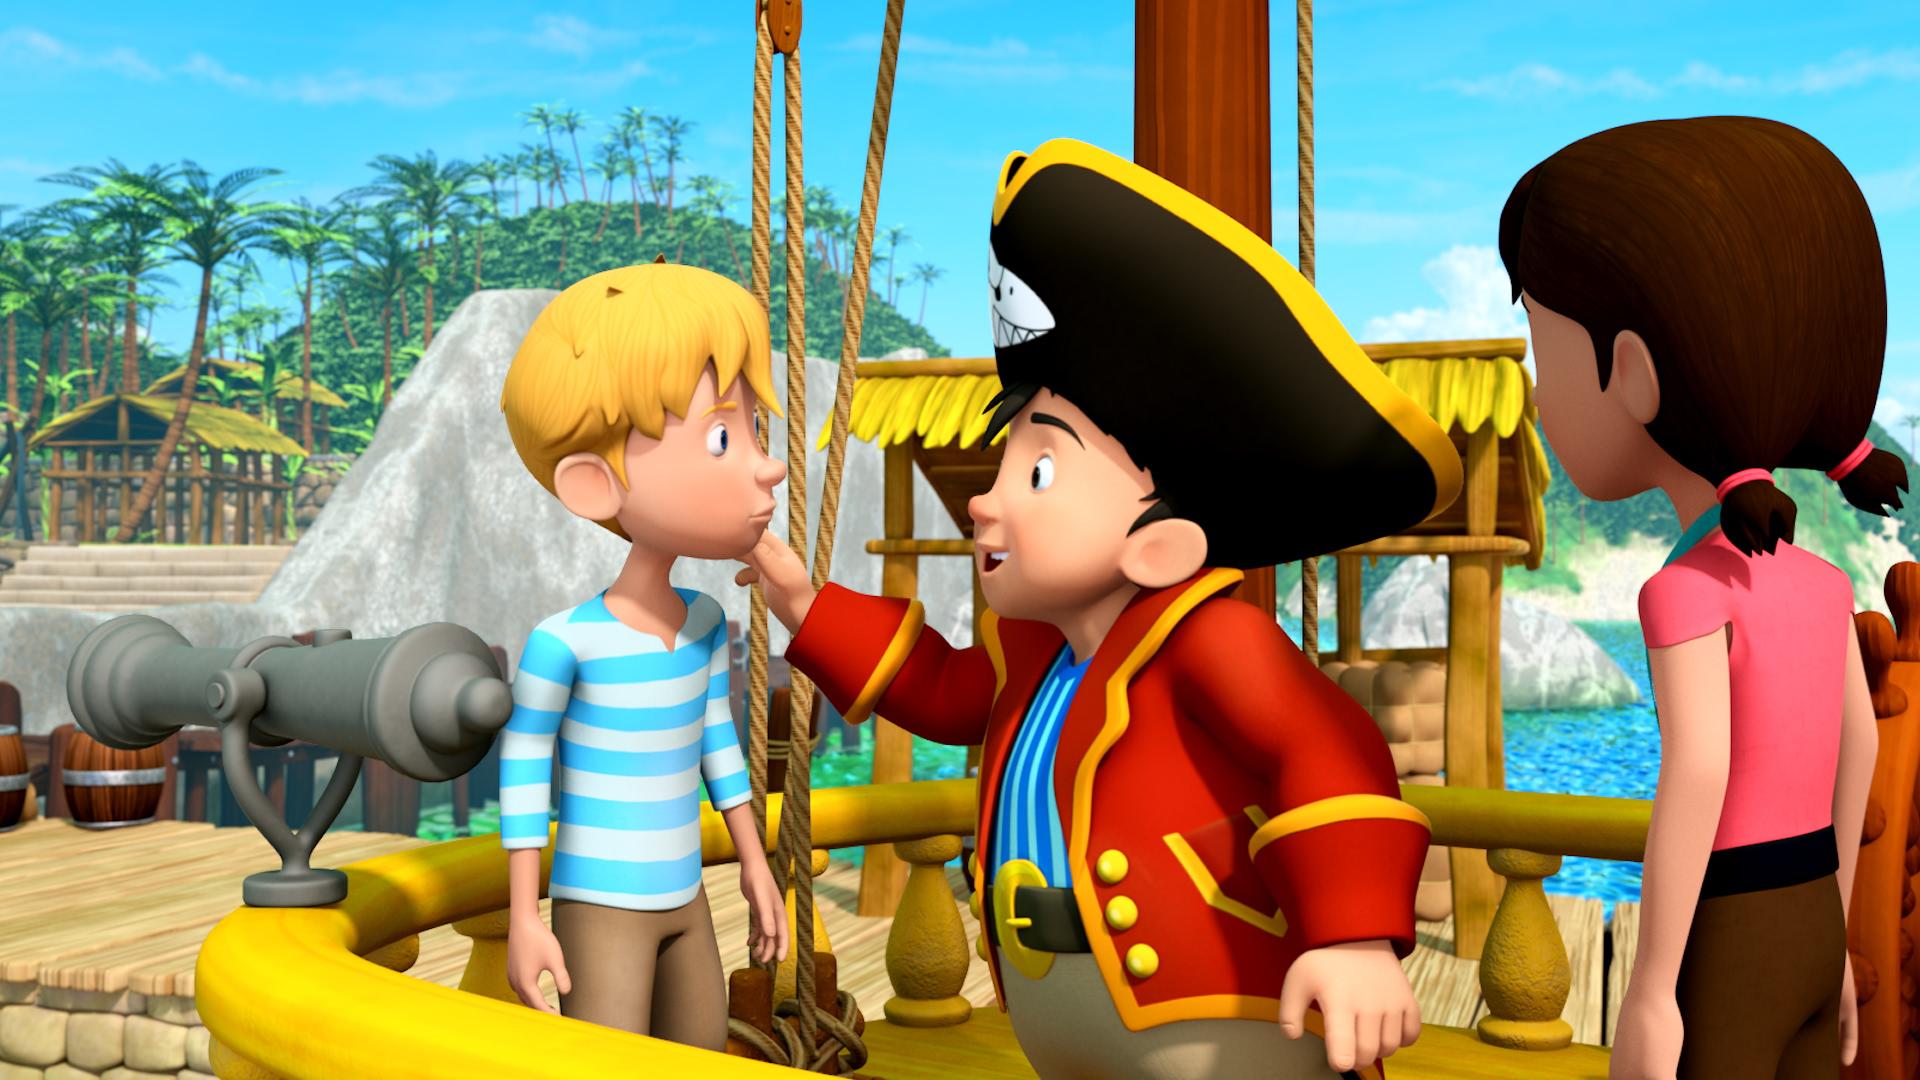 Капитан семи морей смотреть фото